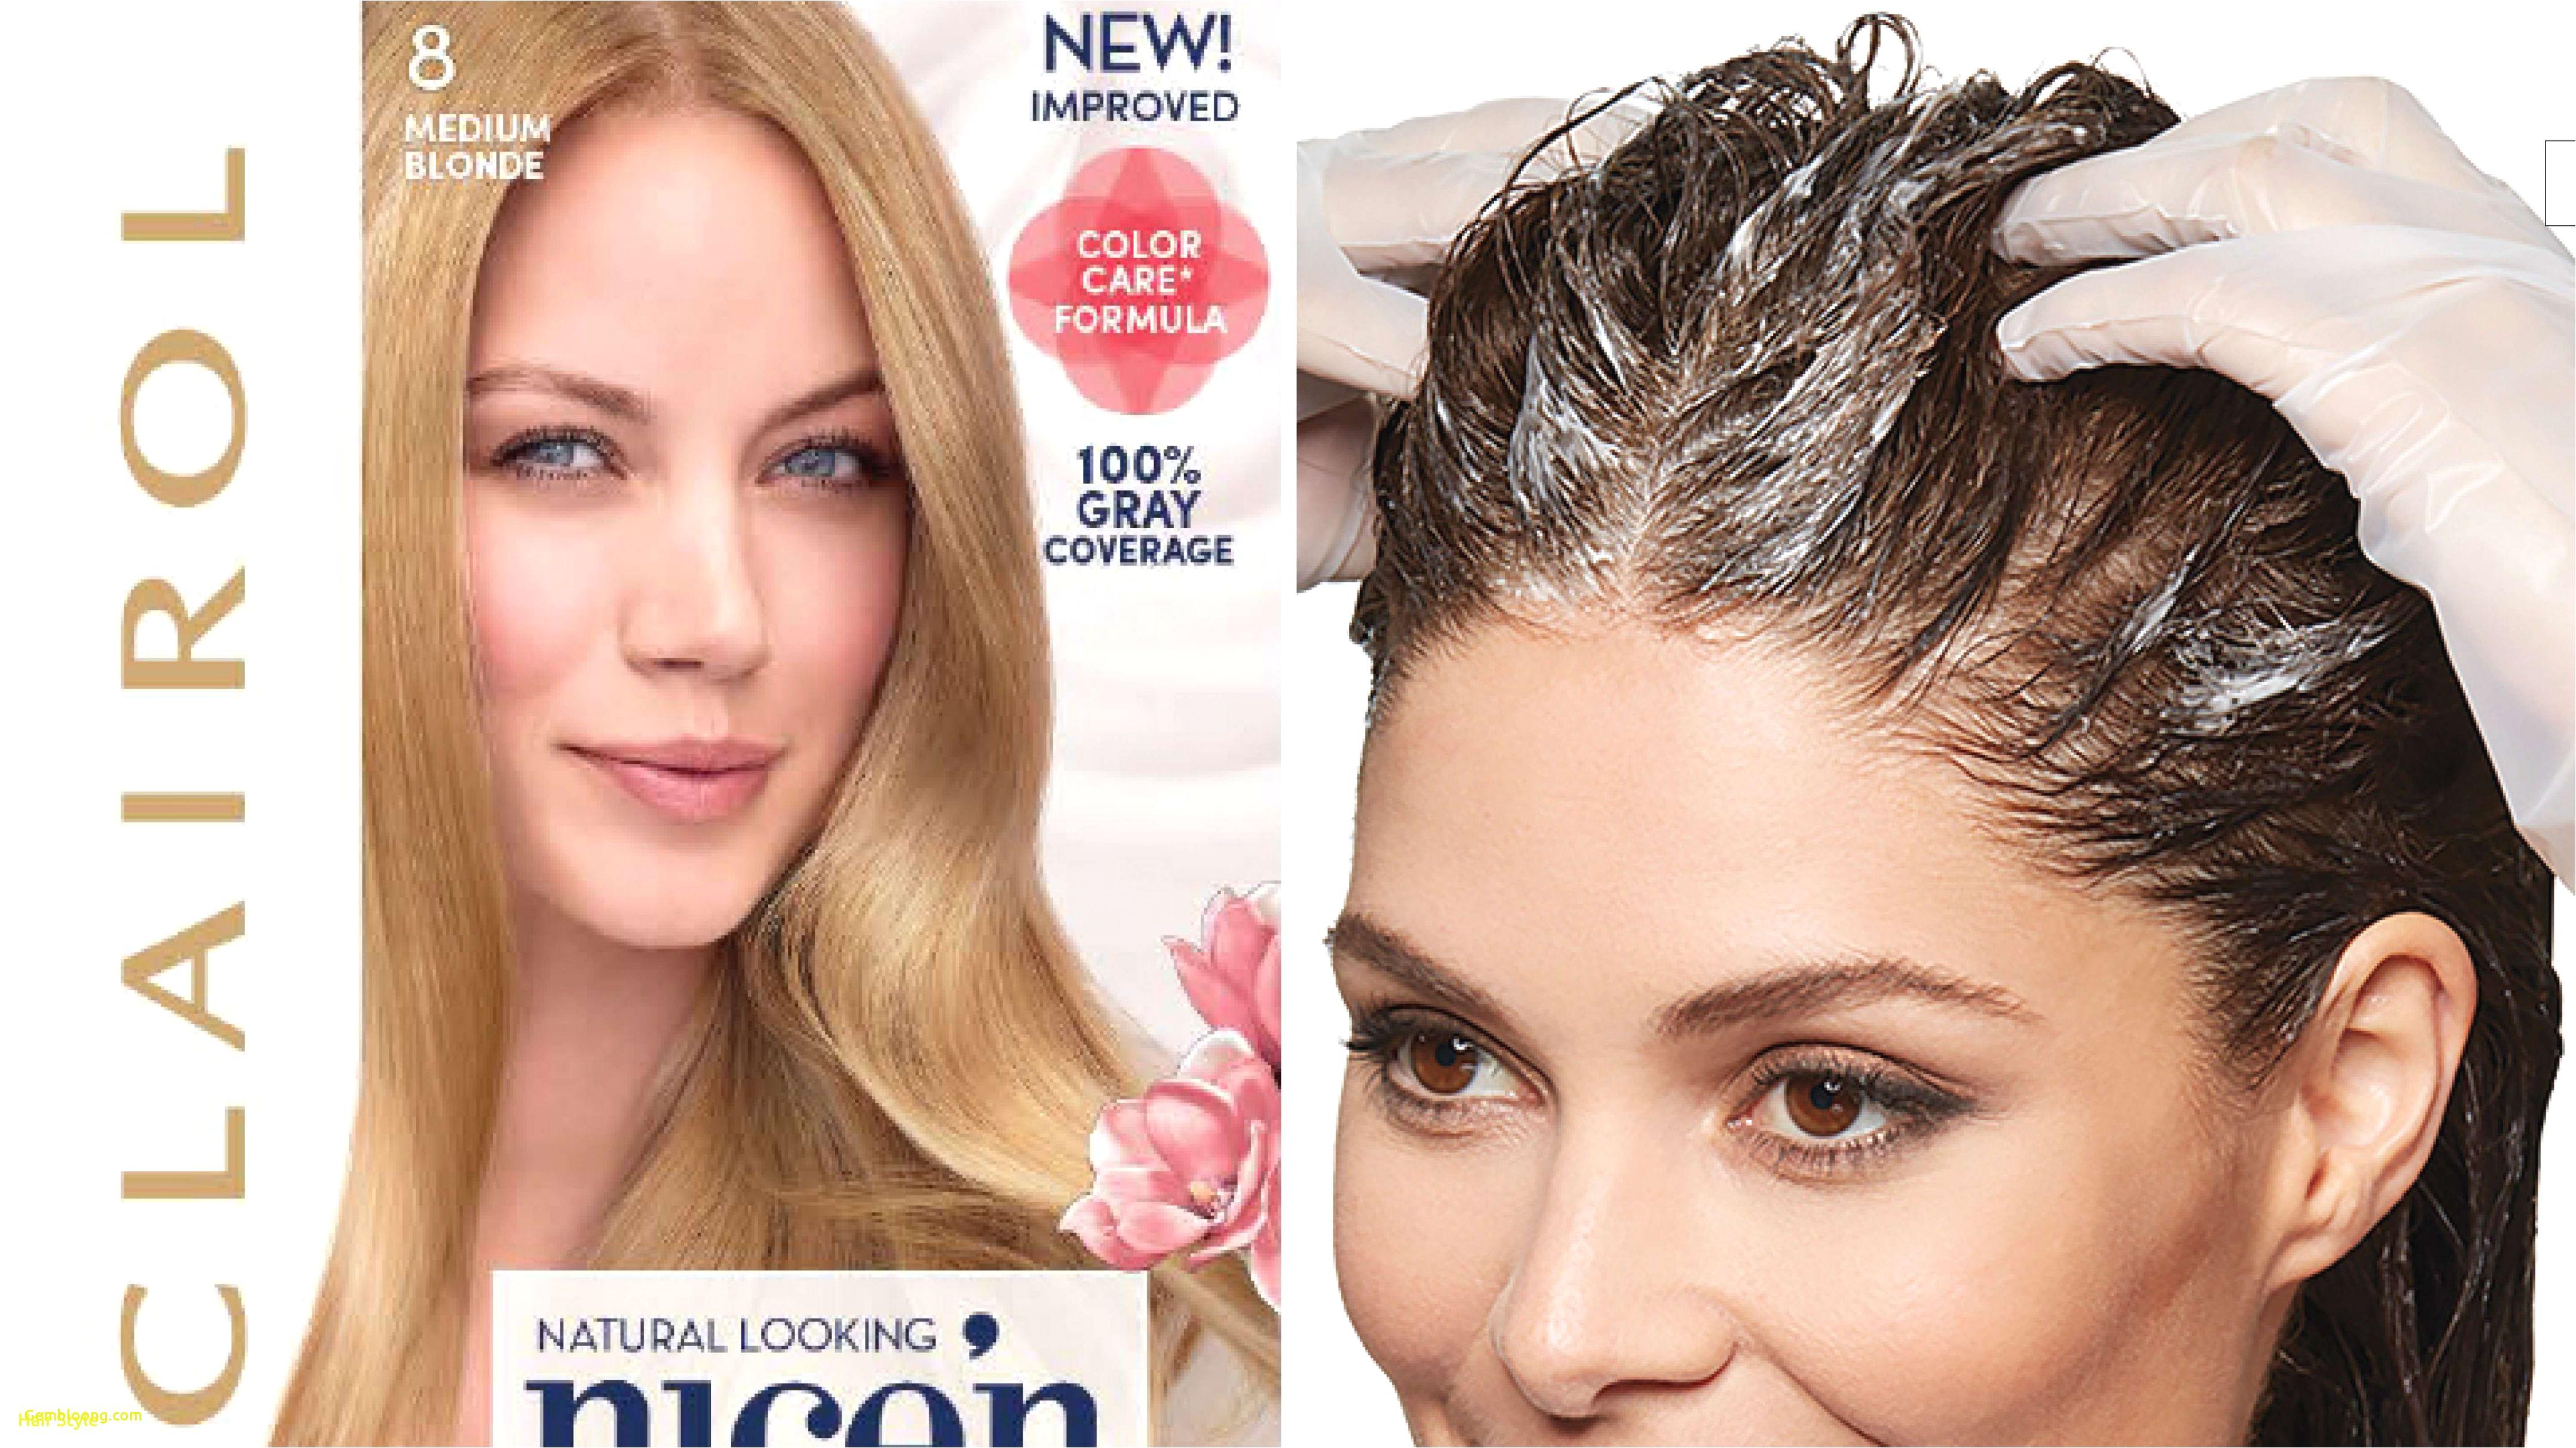 unique hair dye styles beautiful i pinimg 1200x 0d 60 8a 0d608a58a4bb3ed3b african american bob hairstyles